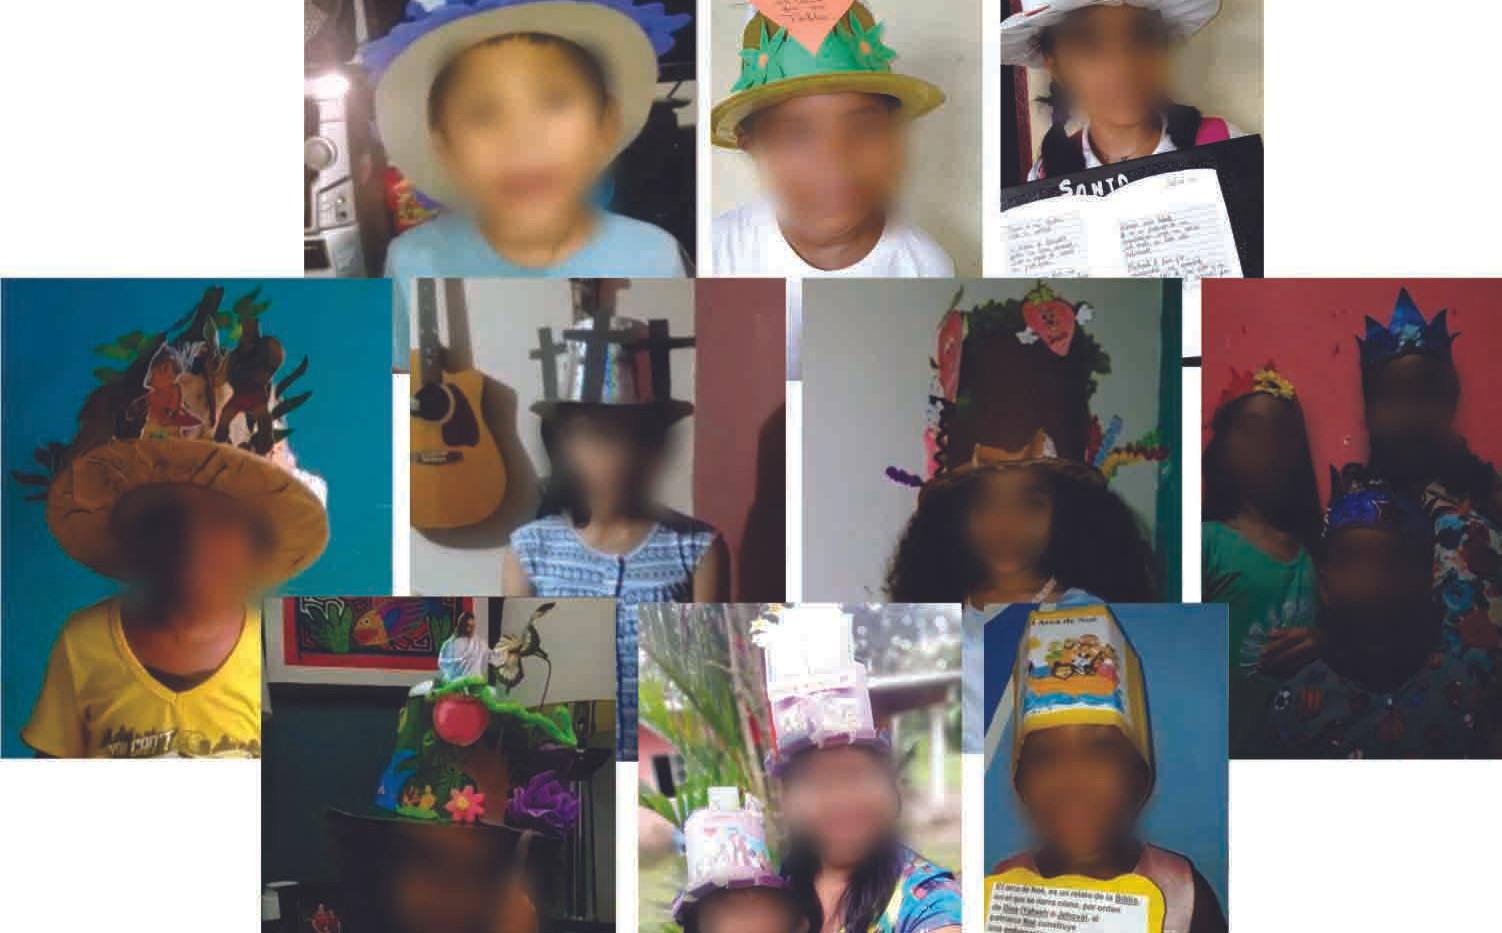 THE BIBLICAL CRAZY HAT